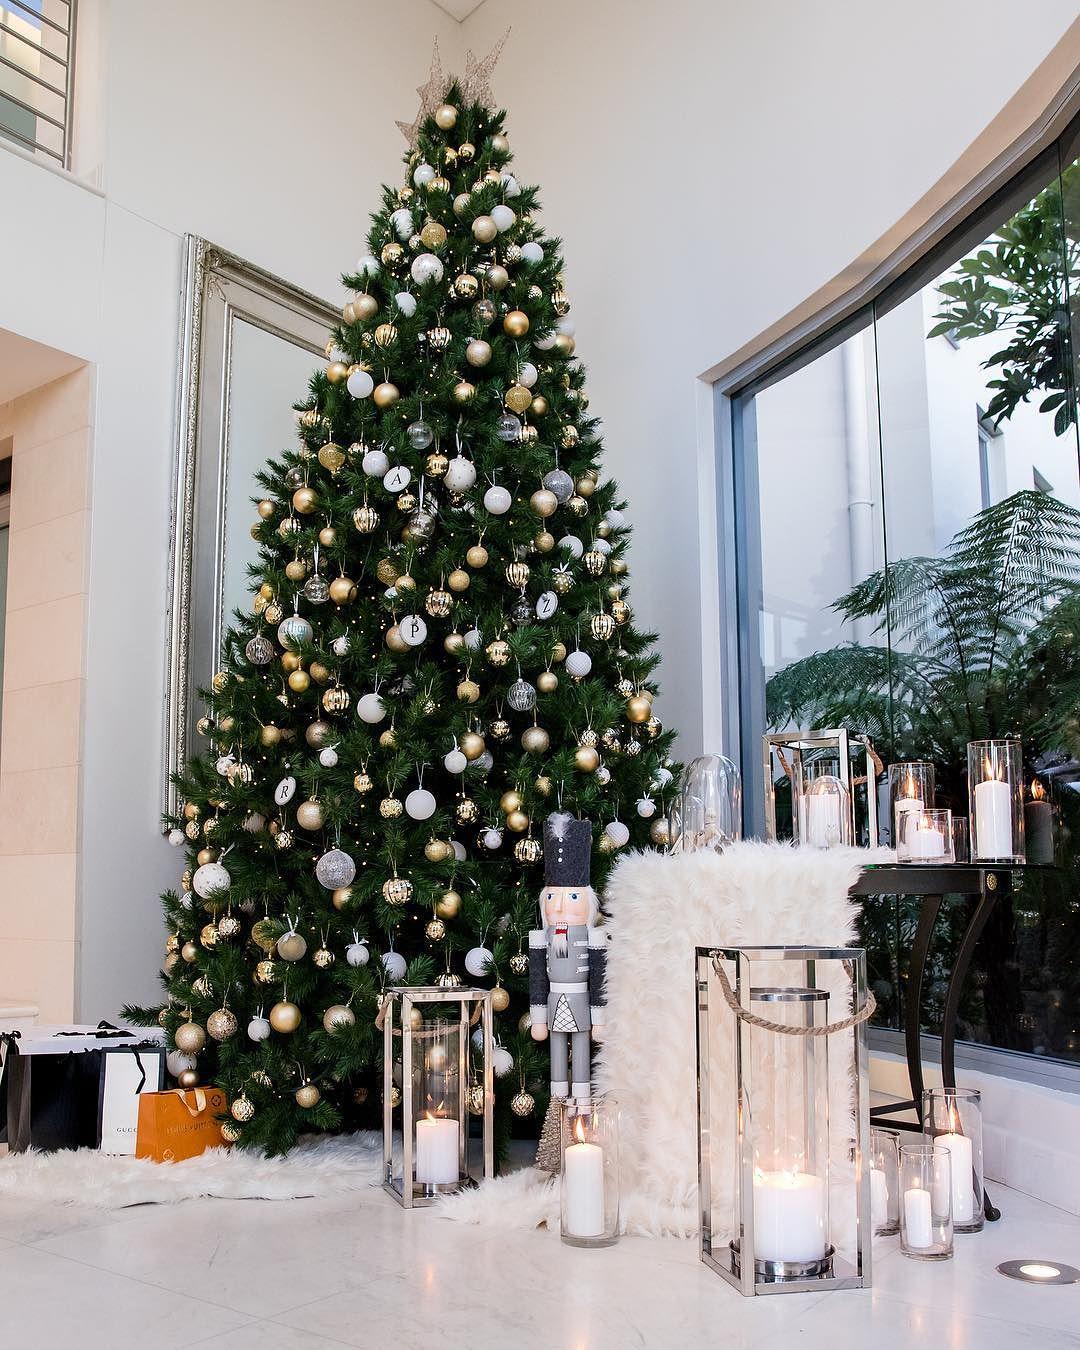 Velas led para decorar eventos 60 ideas para agregar for Decoracion del hogar con velas